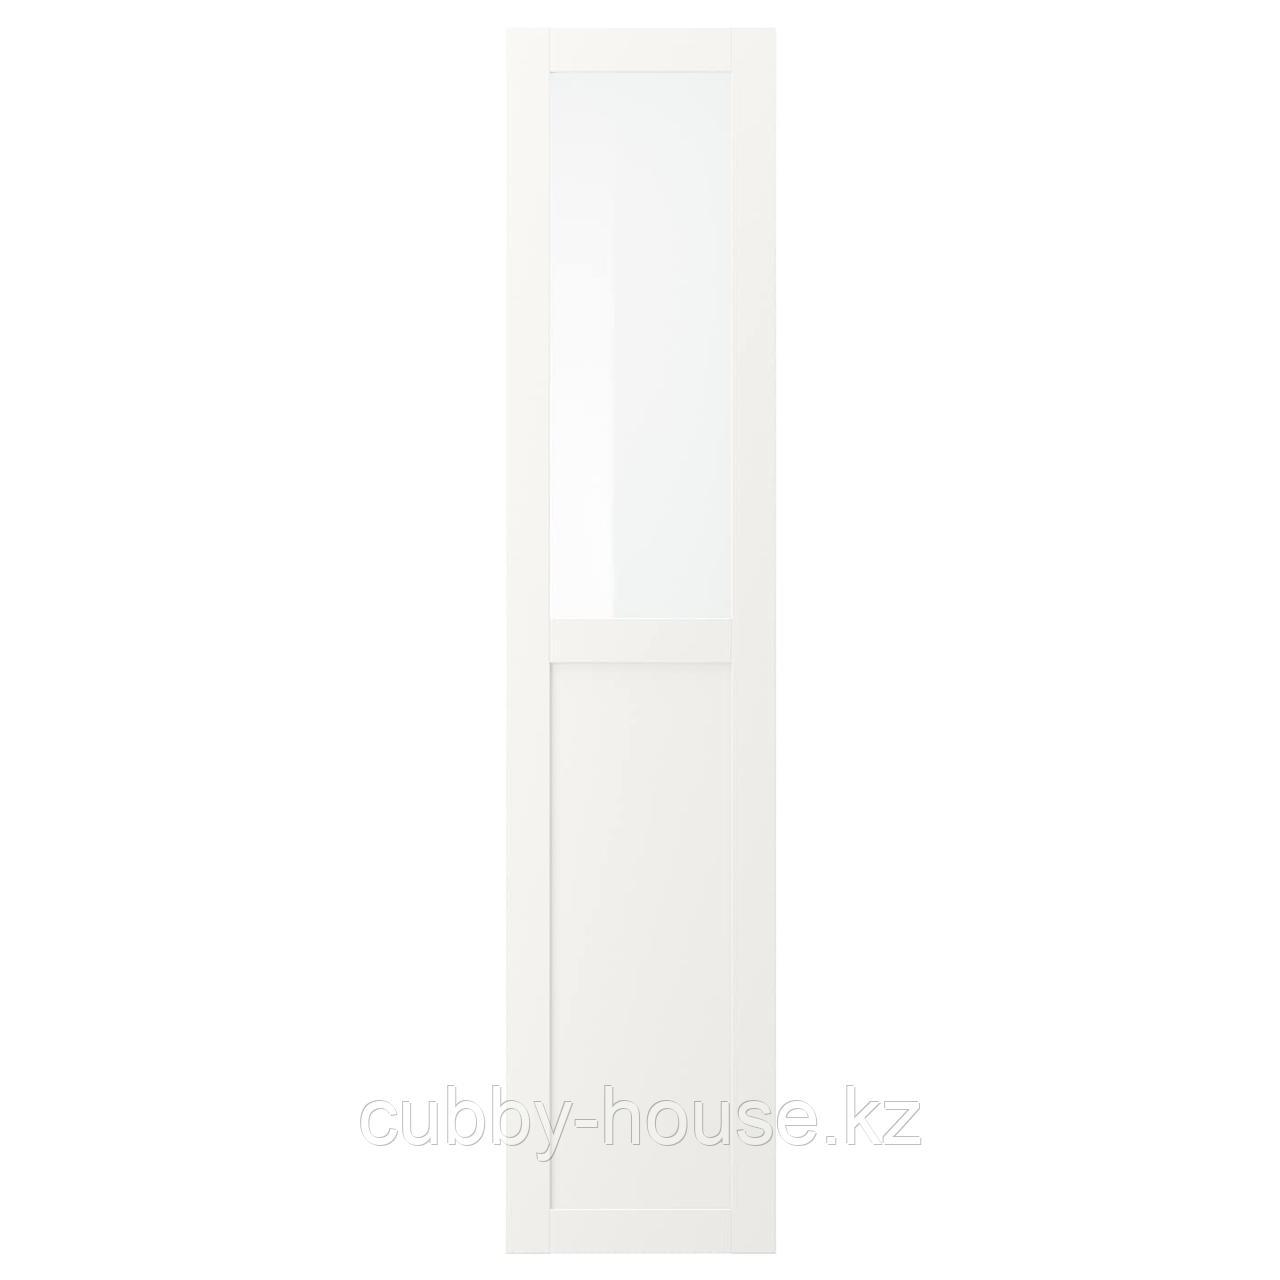 ВЭРД Панельн/стеклян дверца, белый, 40x180 см